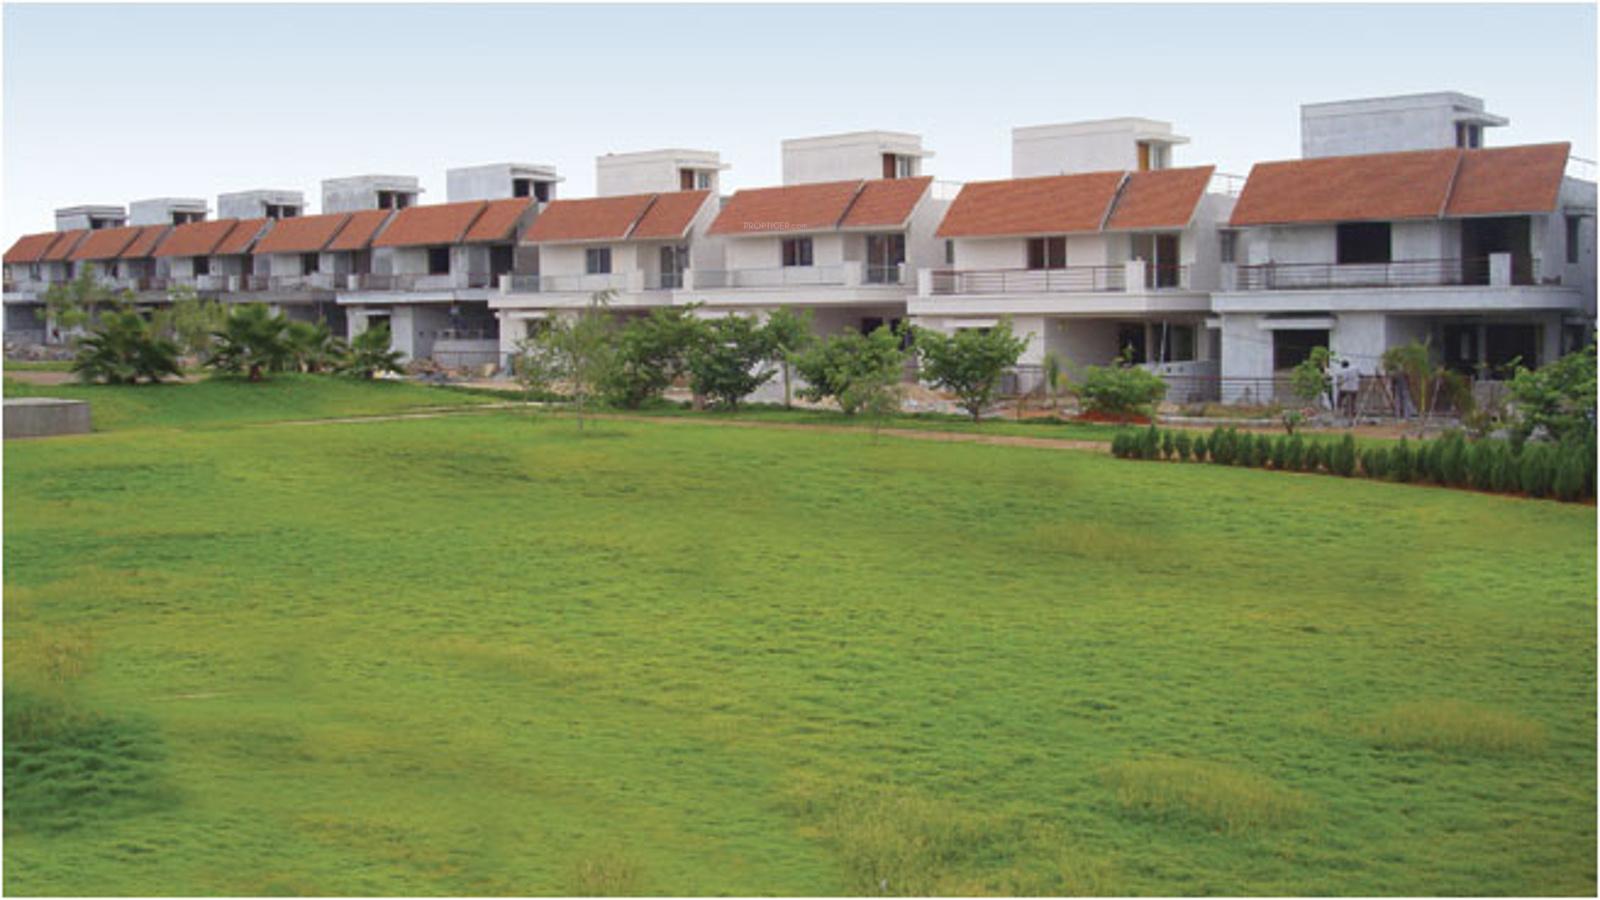 Koncept The Neighbourhood In Kompally Hyderabad Price